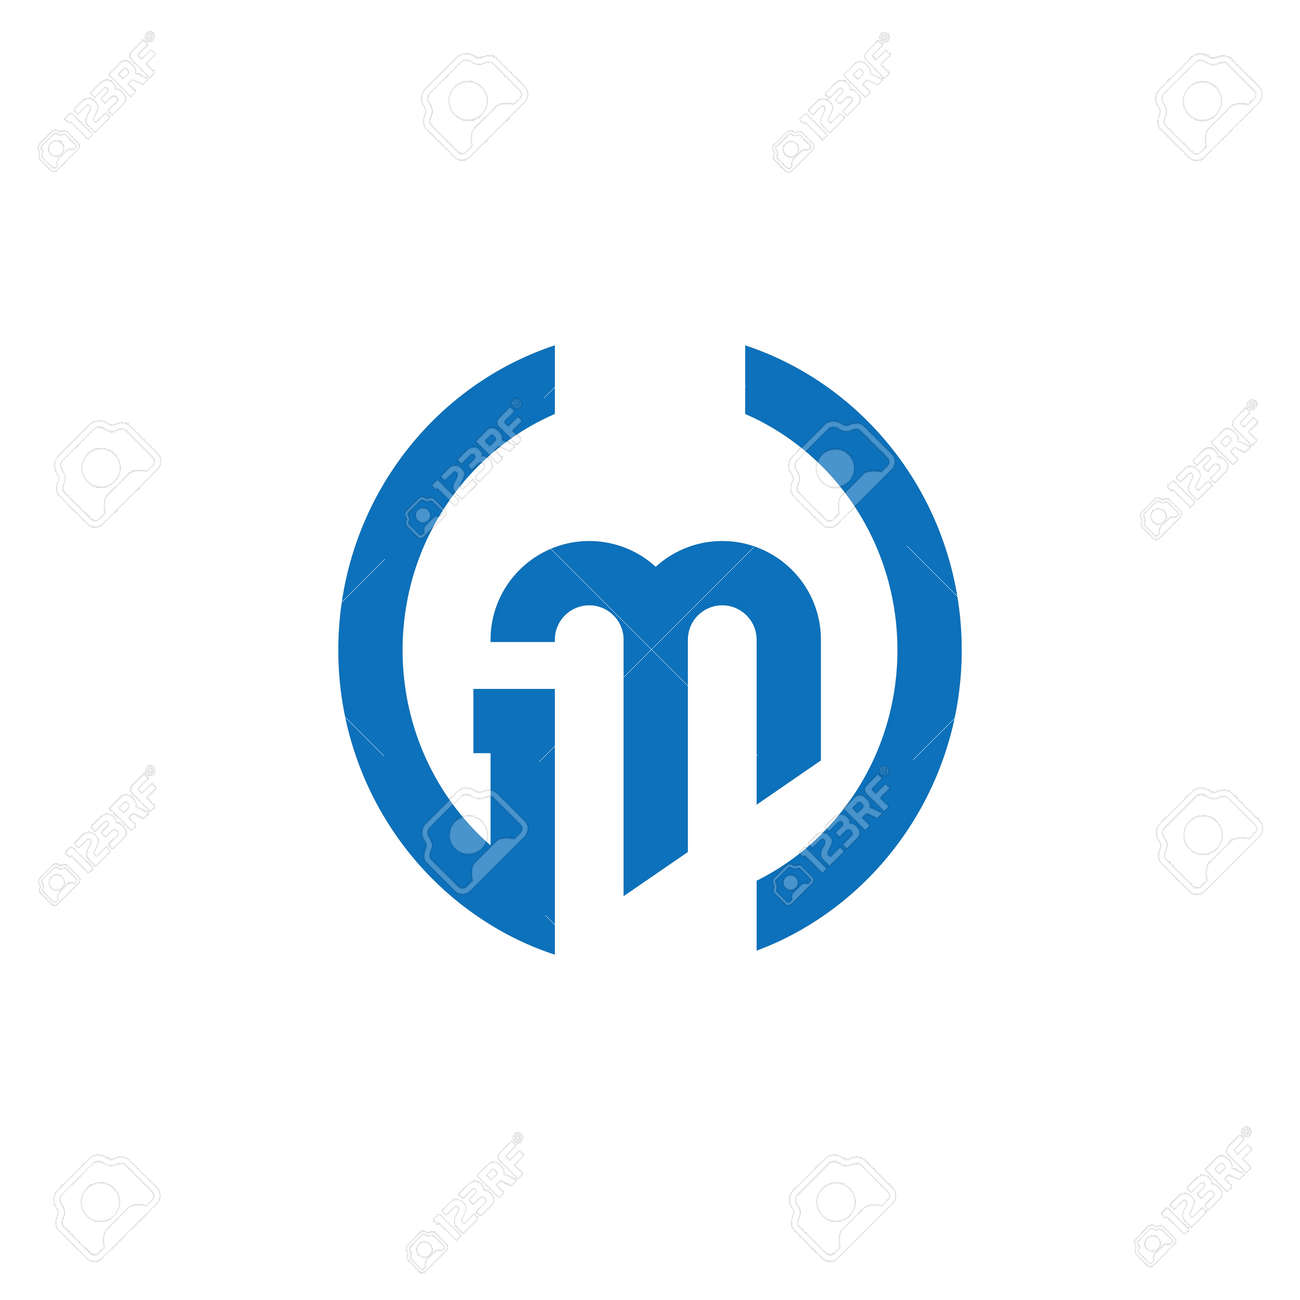 Initial letter gm logo or mg logo vector design template - 157602457